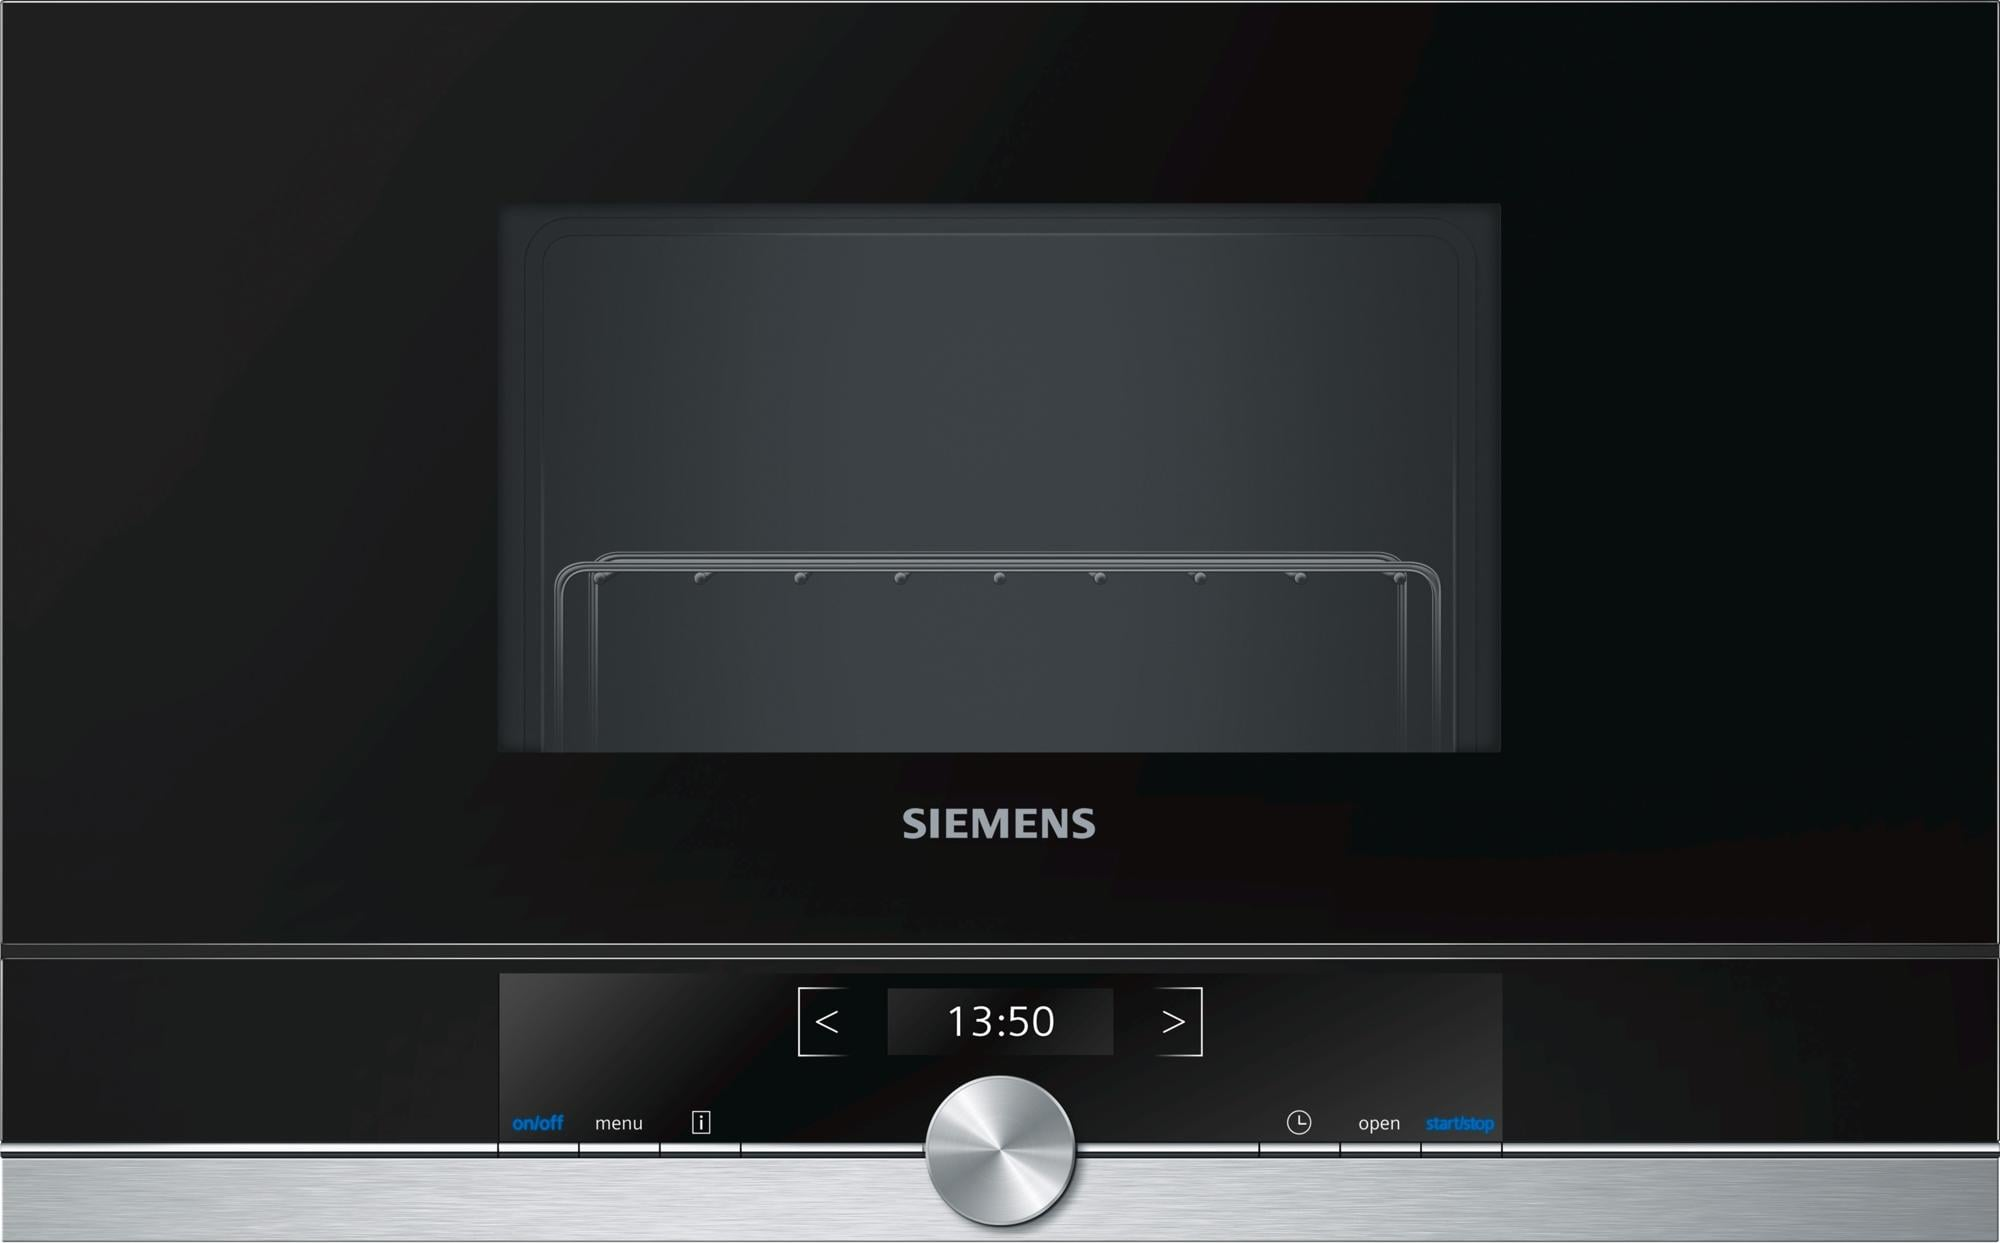 Siemens Kühlschrank 45 Cm Breit : Siemens be lgs einbau mikrowelle w edelstahl cookcontrol